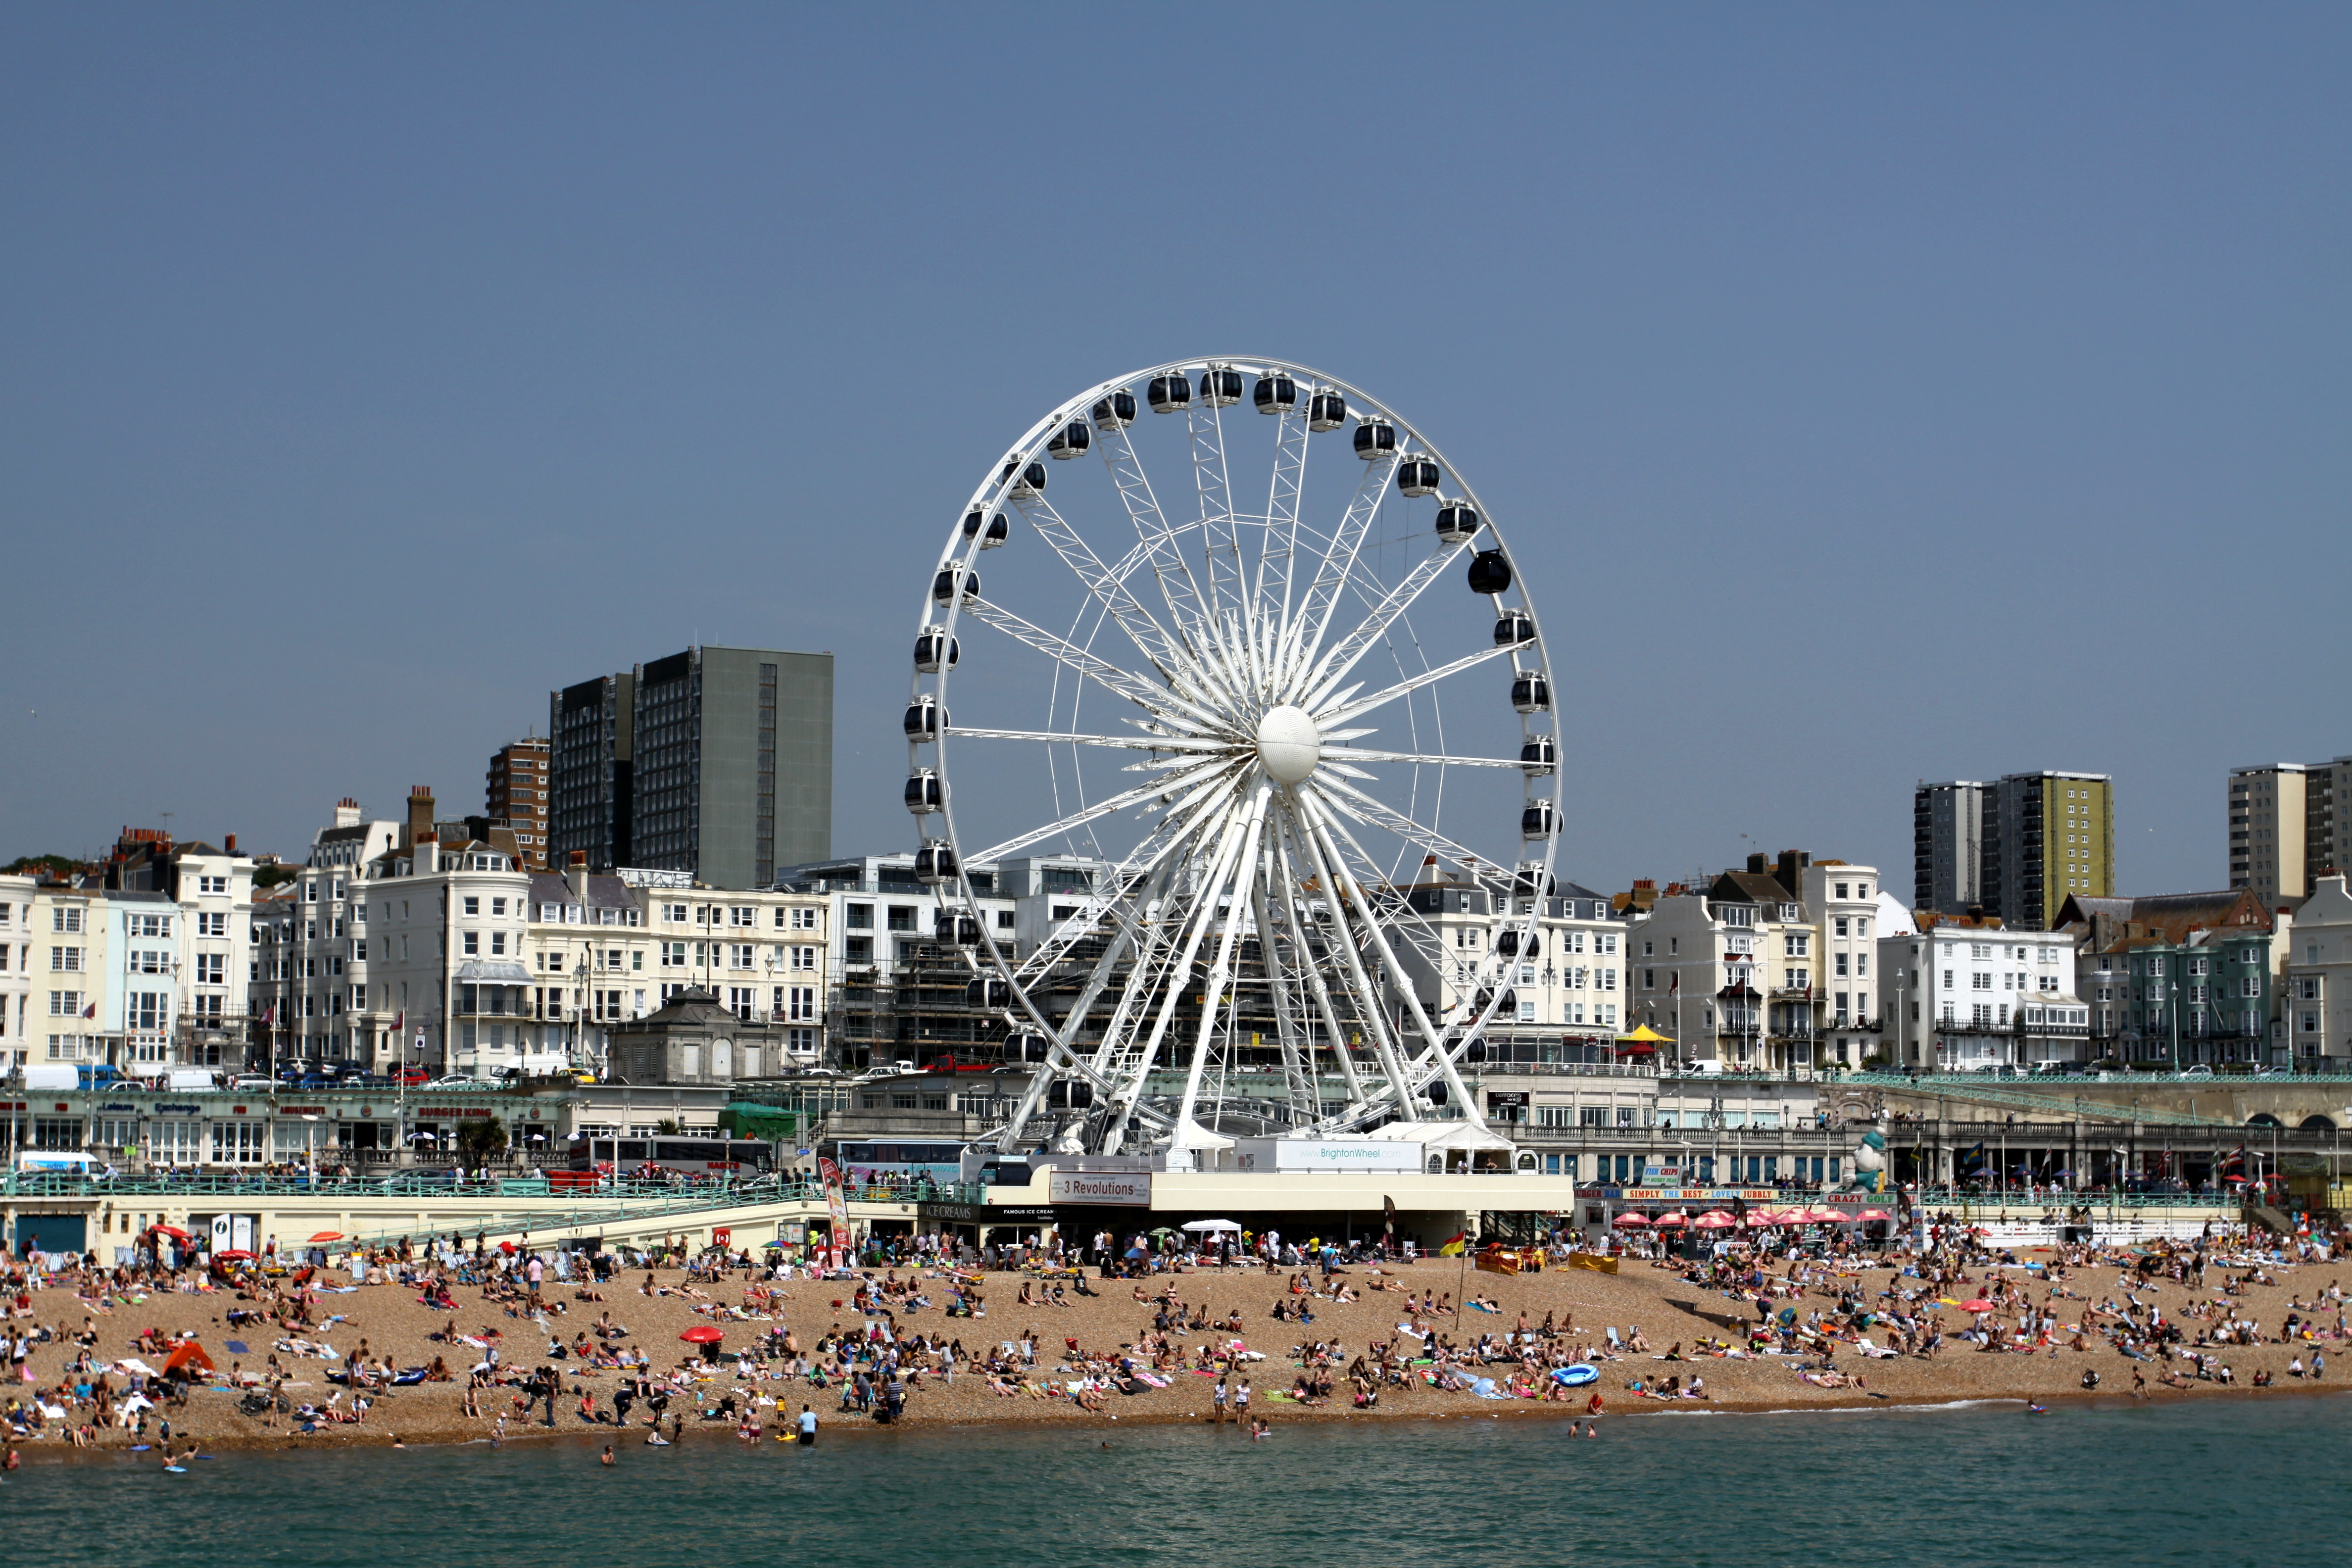 https://upload.wikimedia.org/wikipedia/commons/5/55/Brighton_Wheel_on_the_beach_of_Brighton_in_summer_2013_(10).JPG